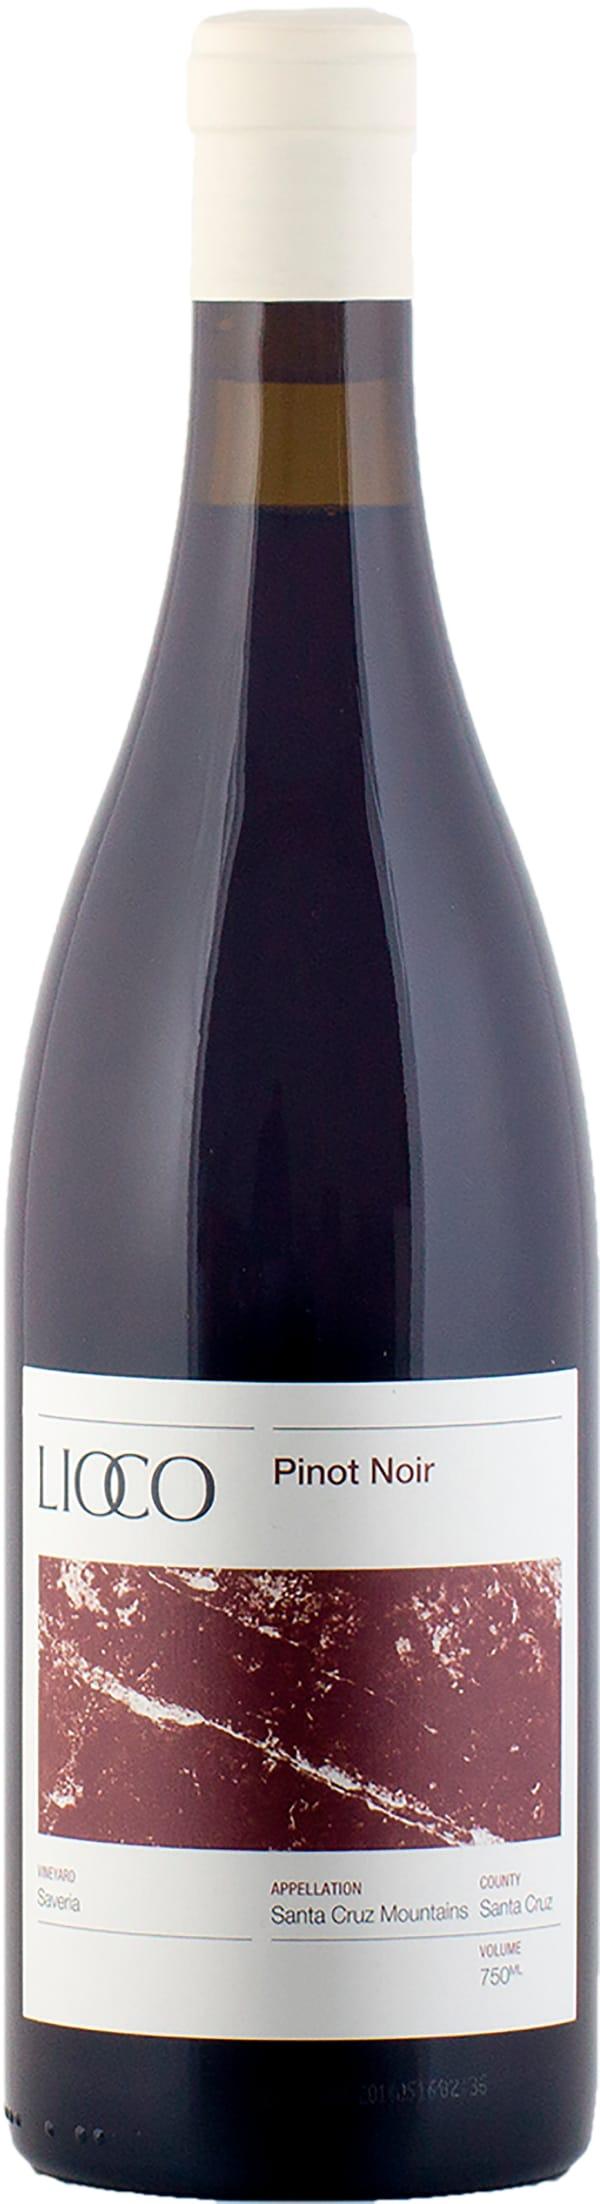 Lioco Saveria Vineyard Pinot Noir 2016